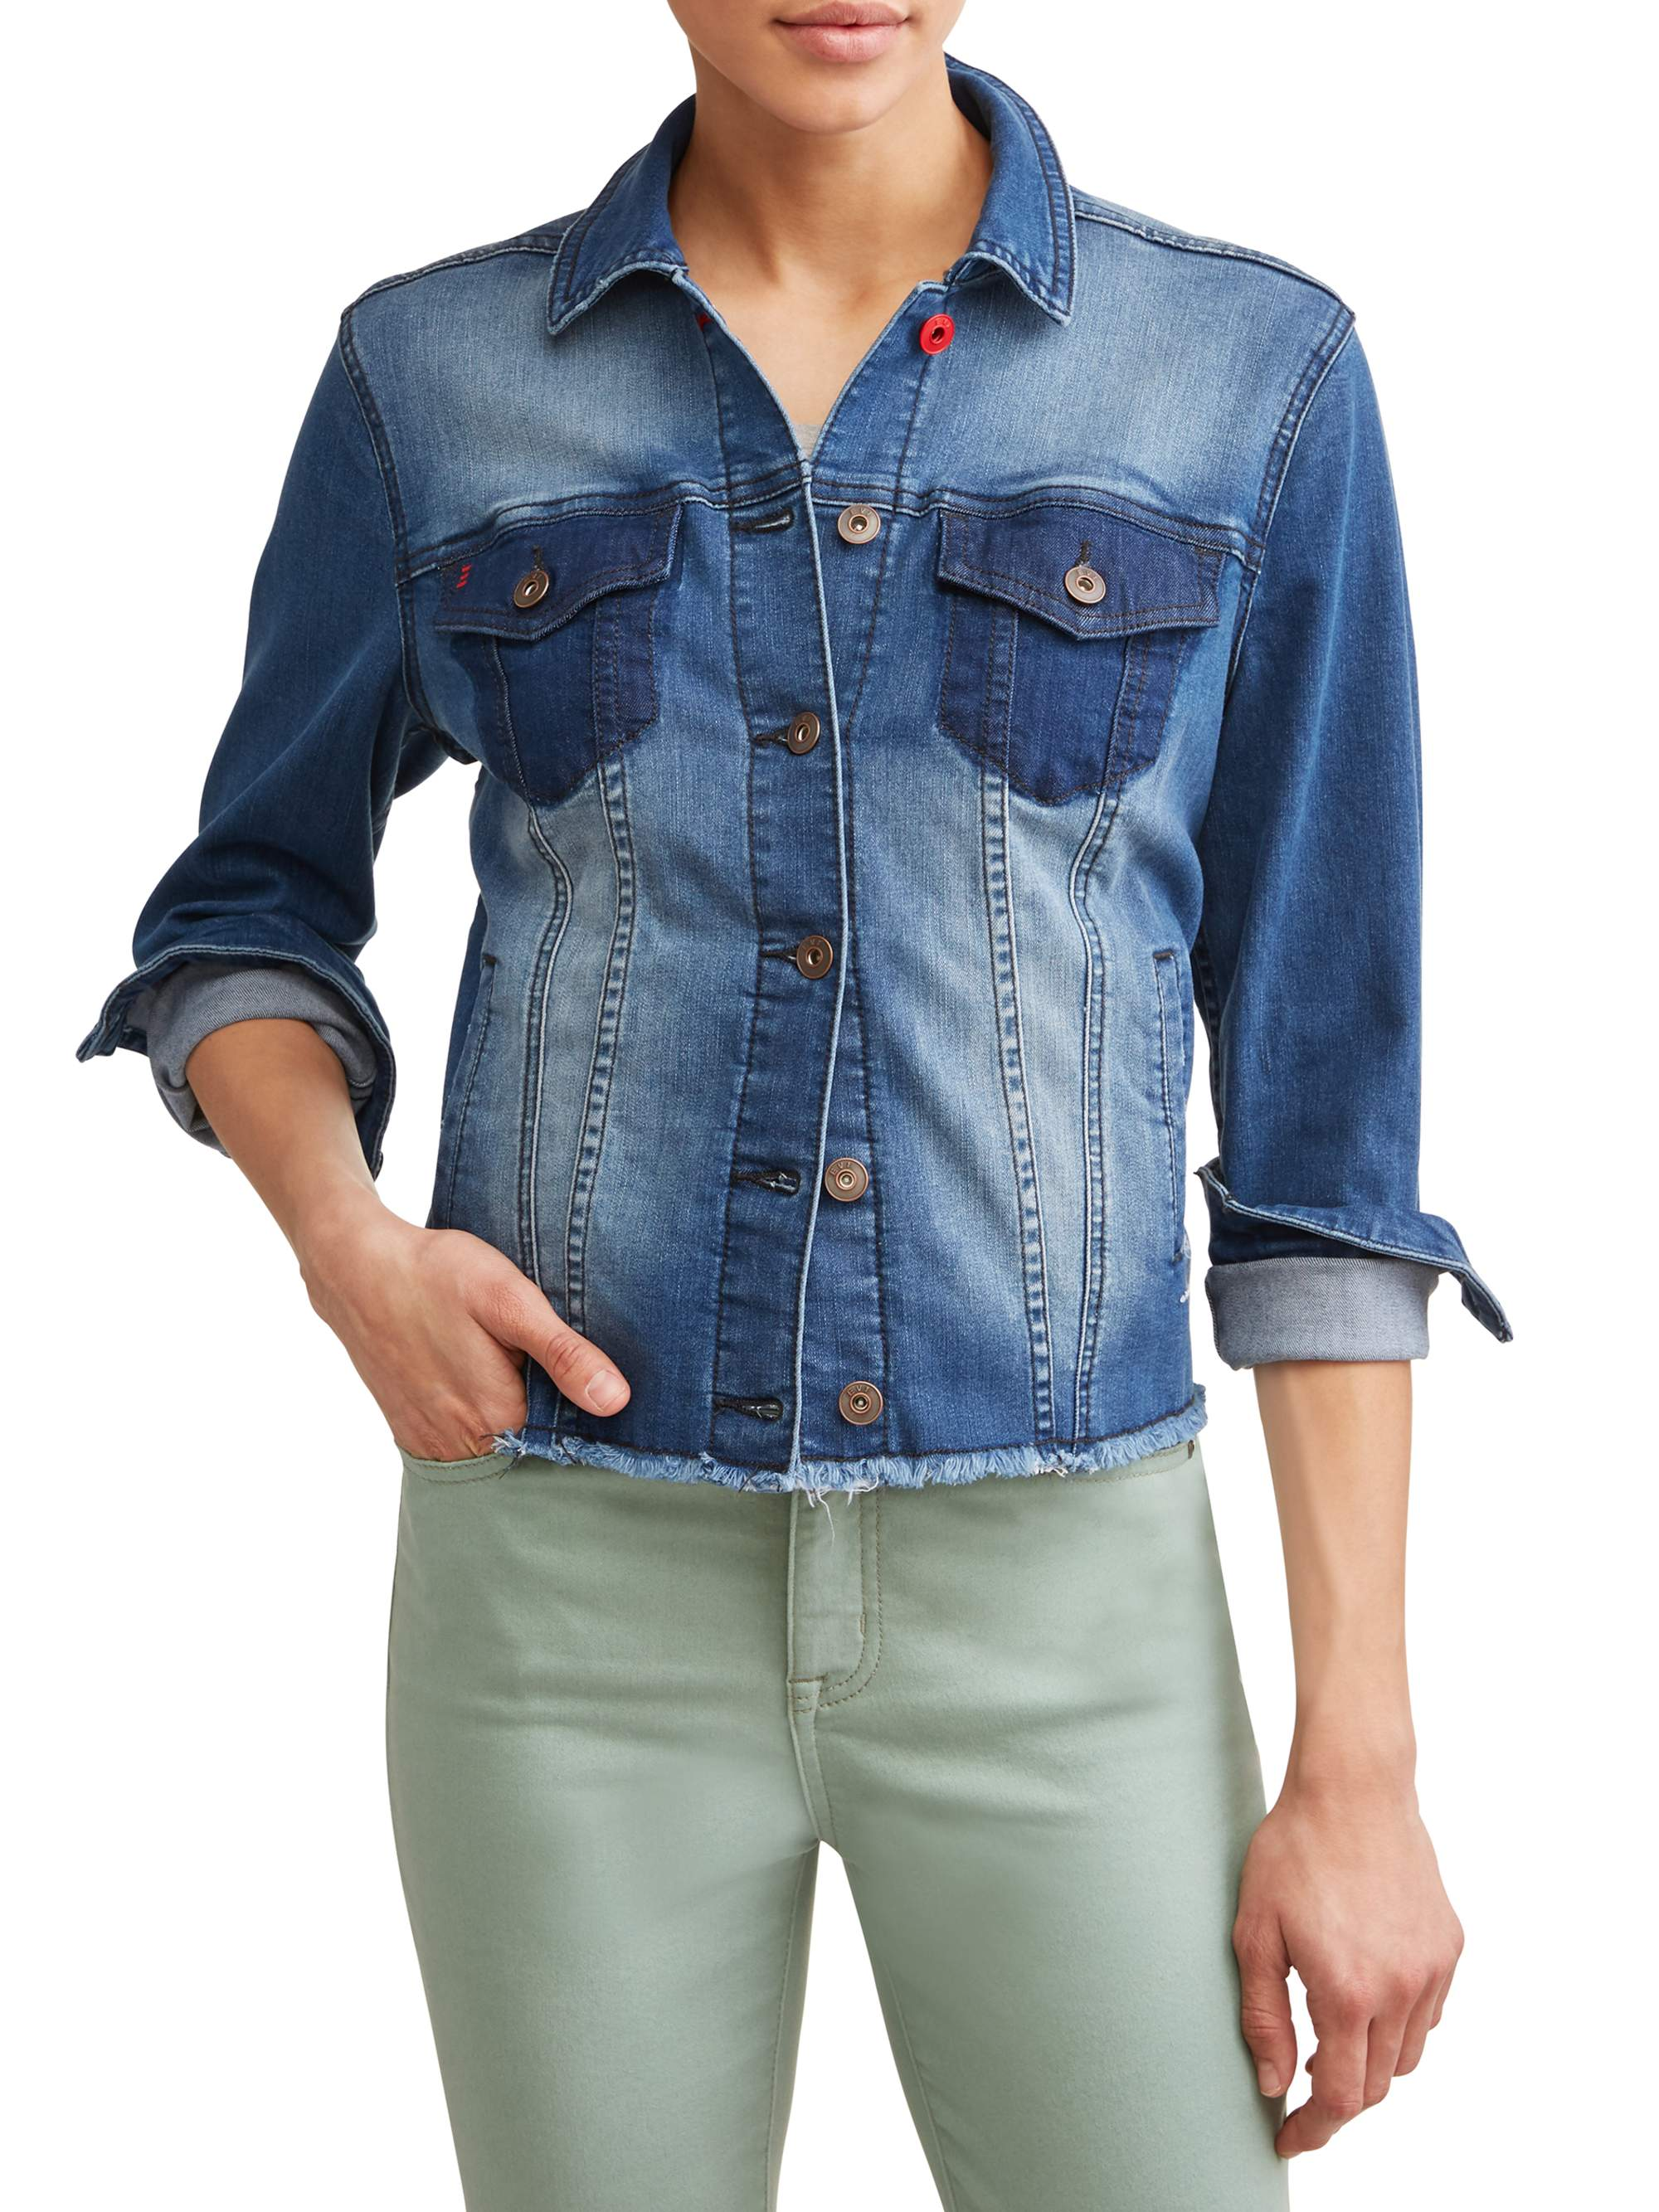 Patchwork Denim Jacket Women's (Medium)